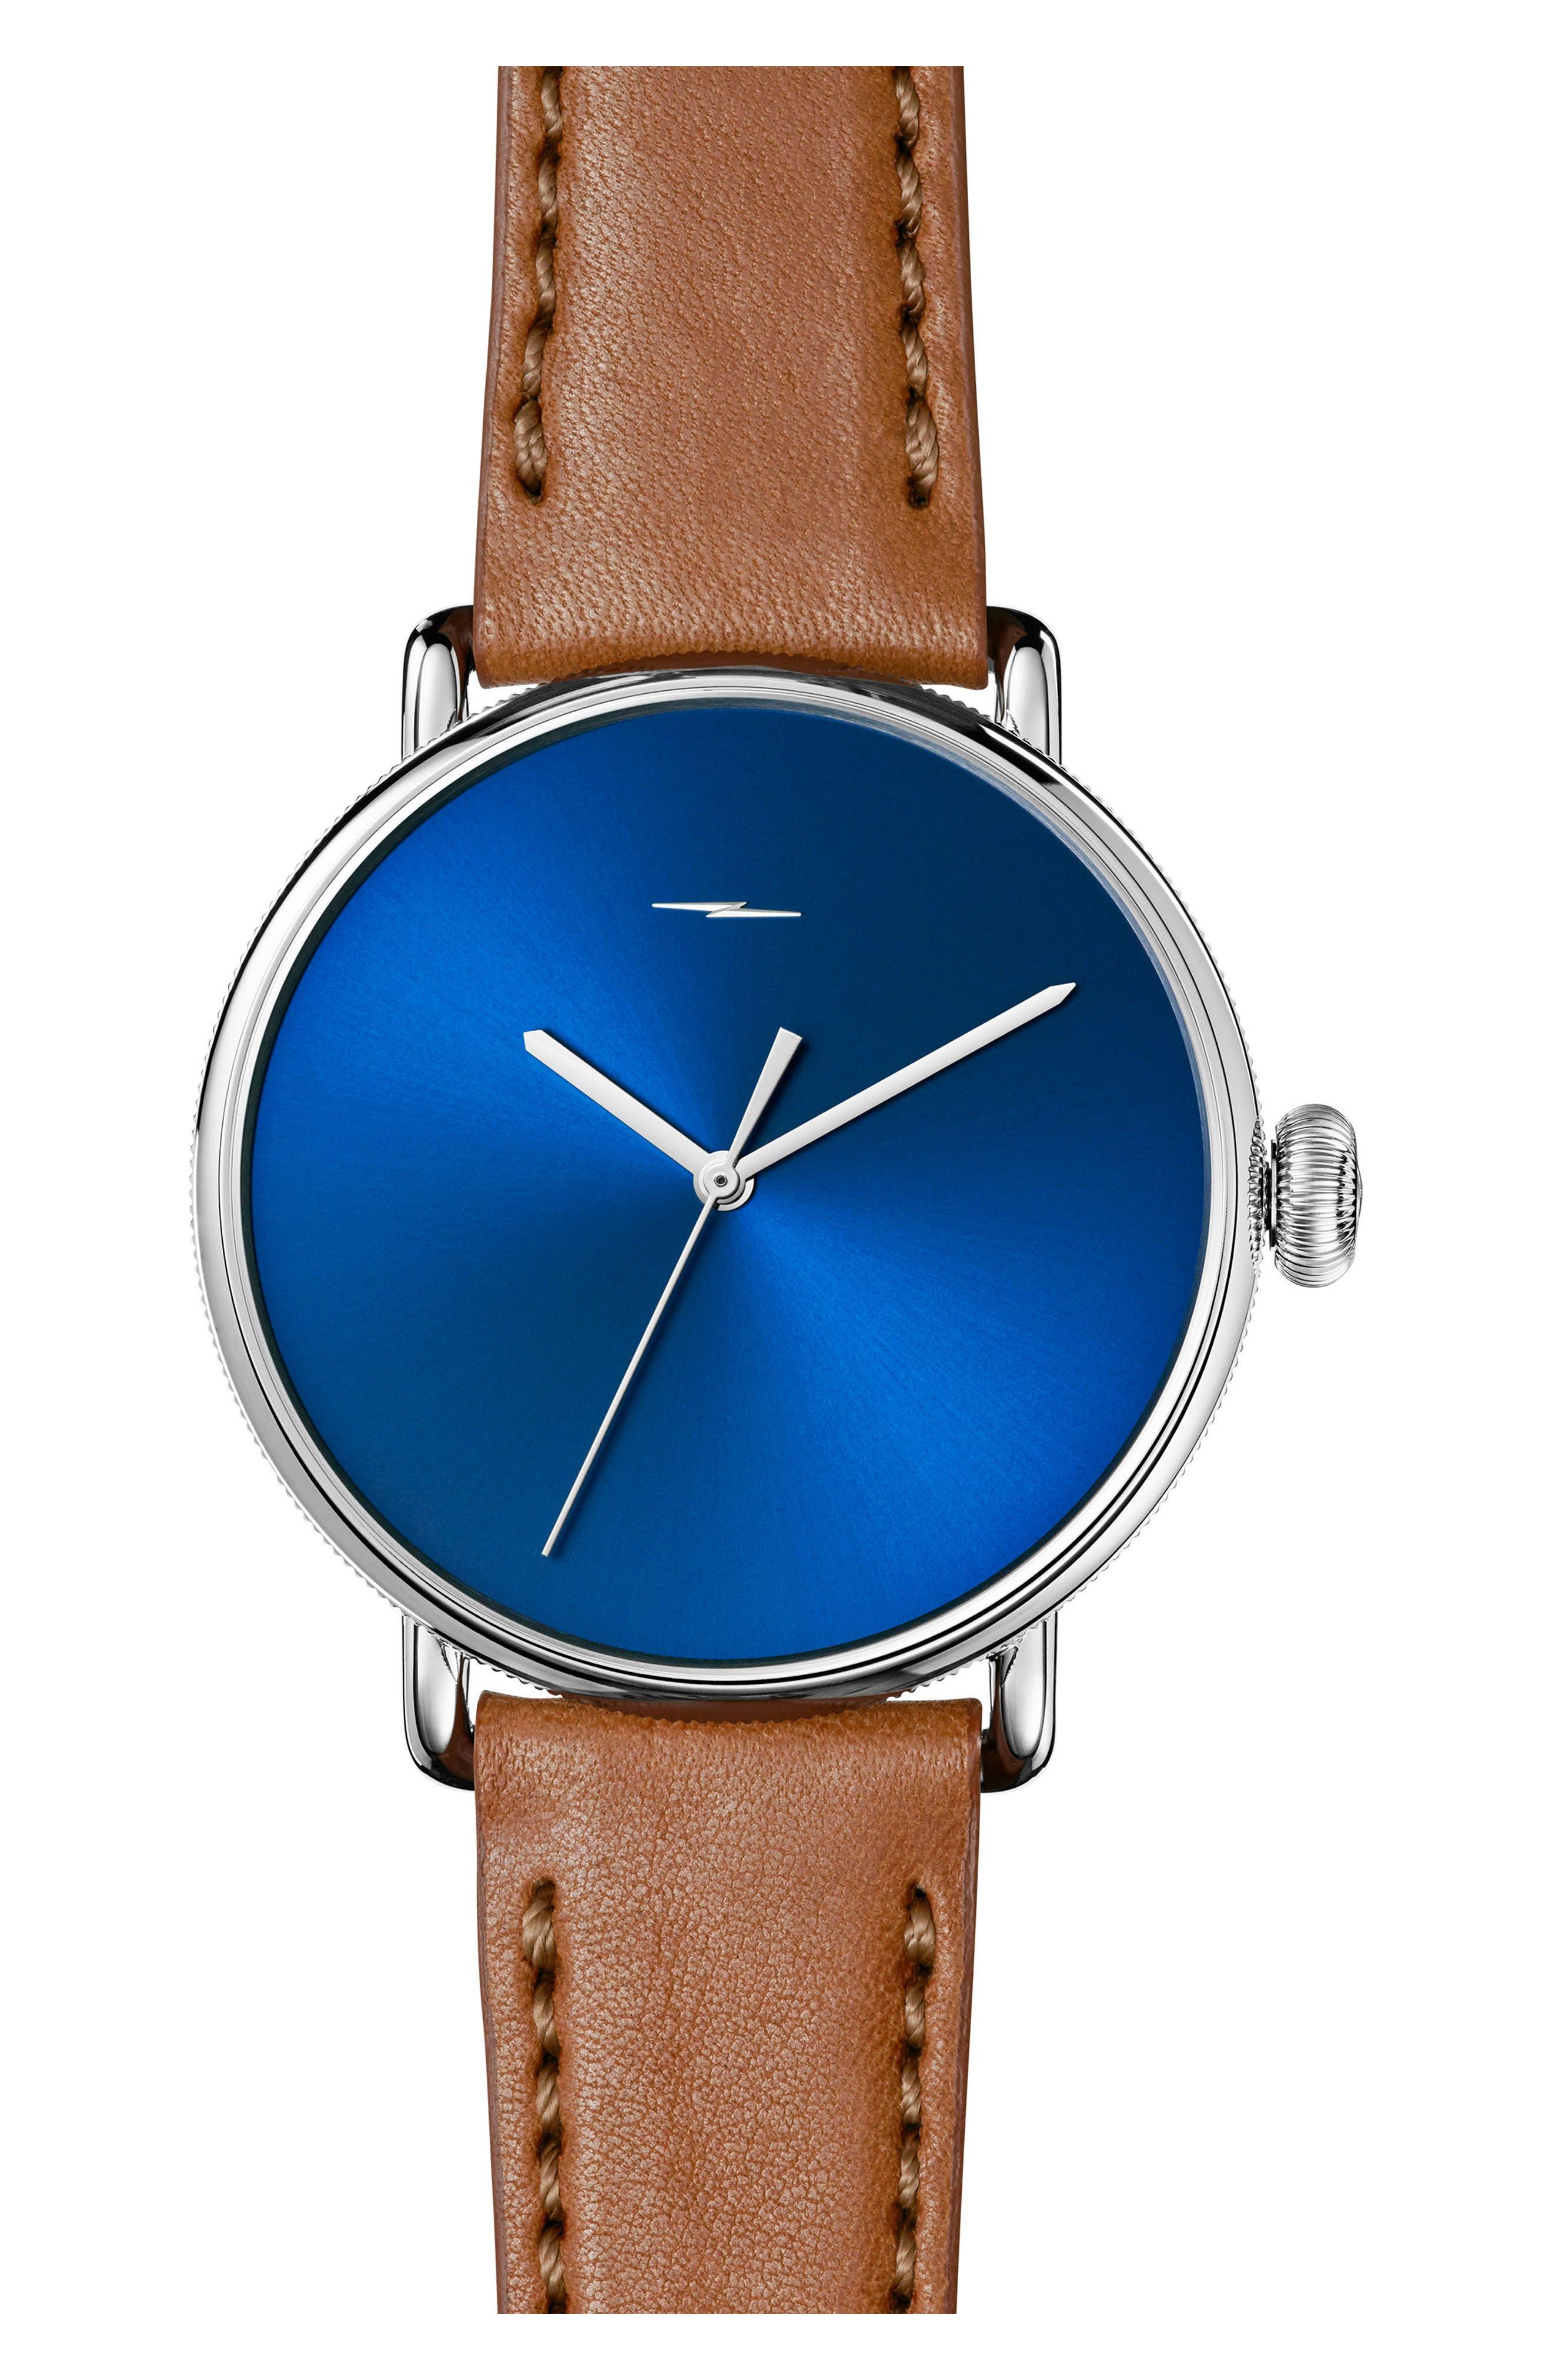 Main Image - Shinola Bolt Leather Strap Watch, 42mm